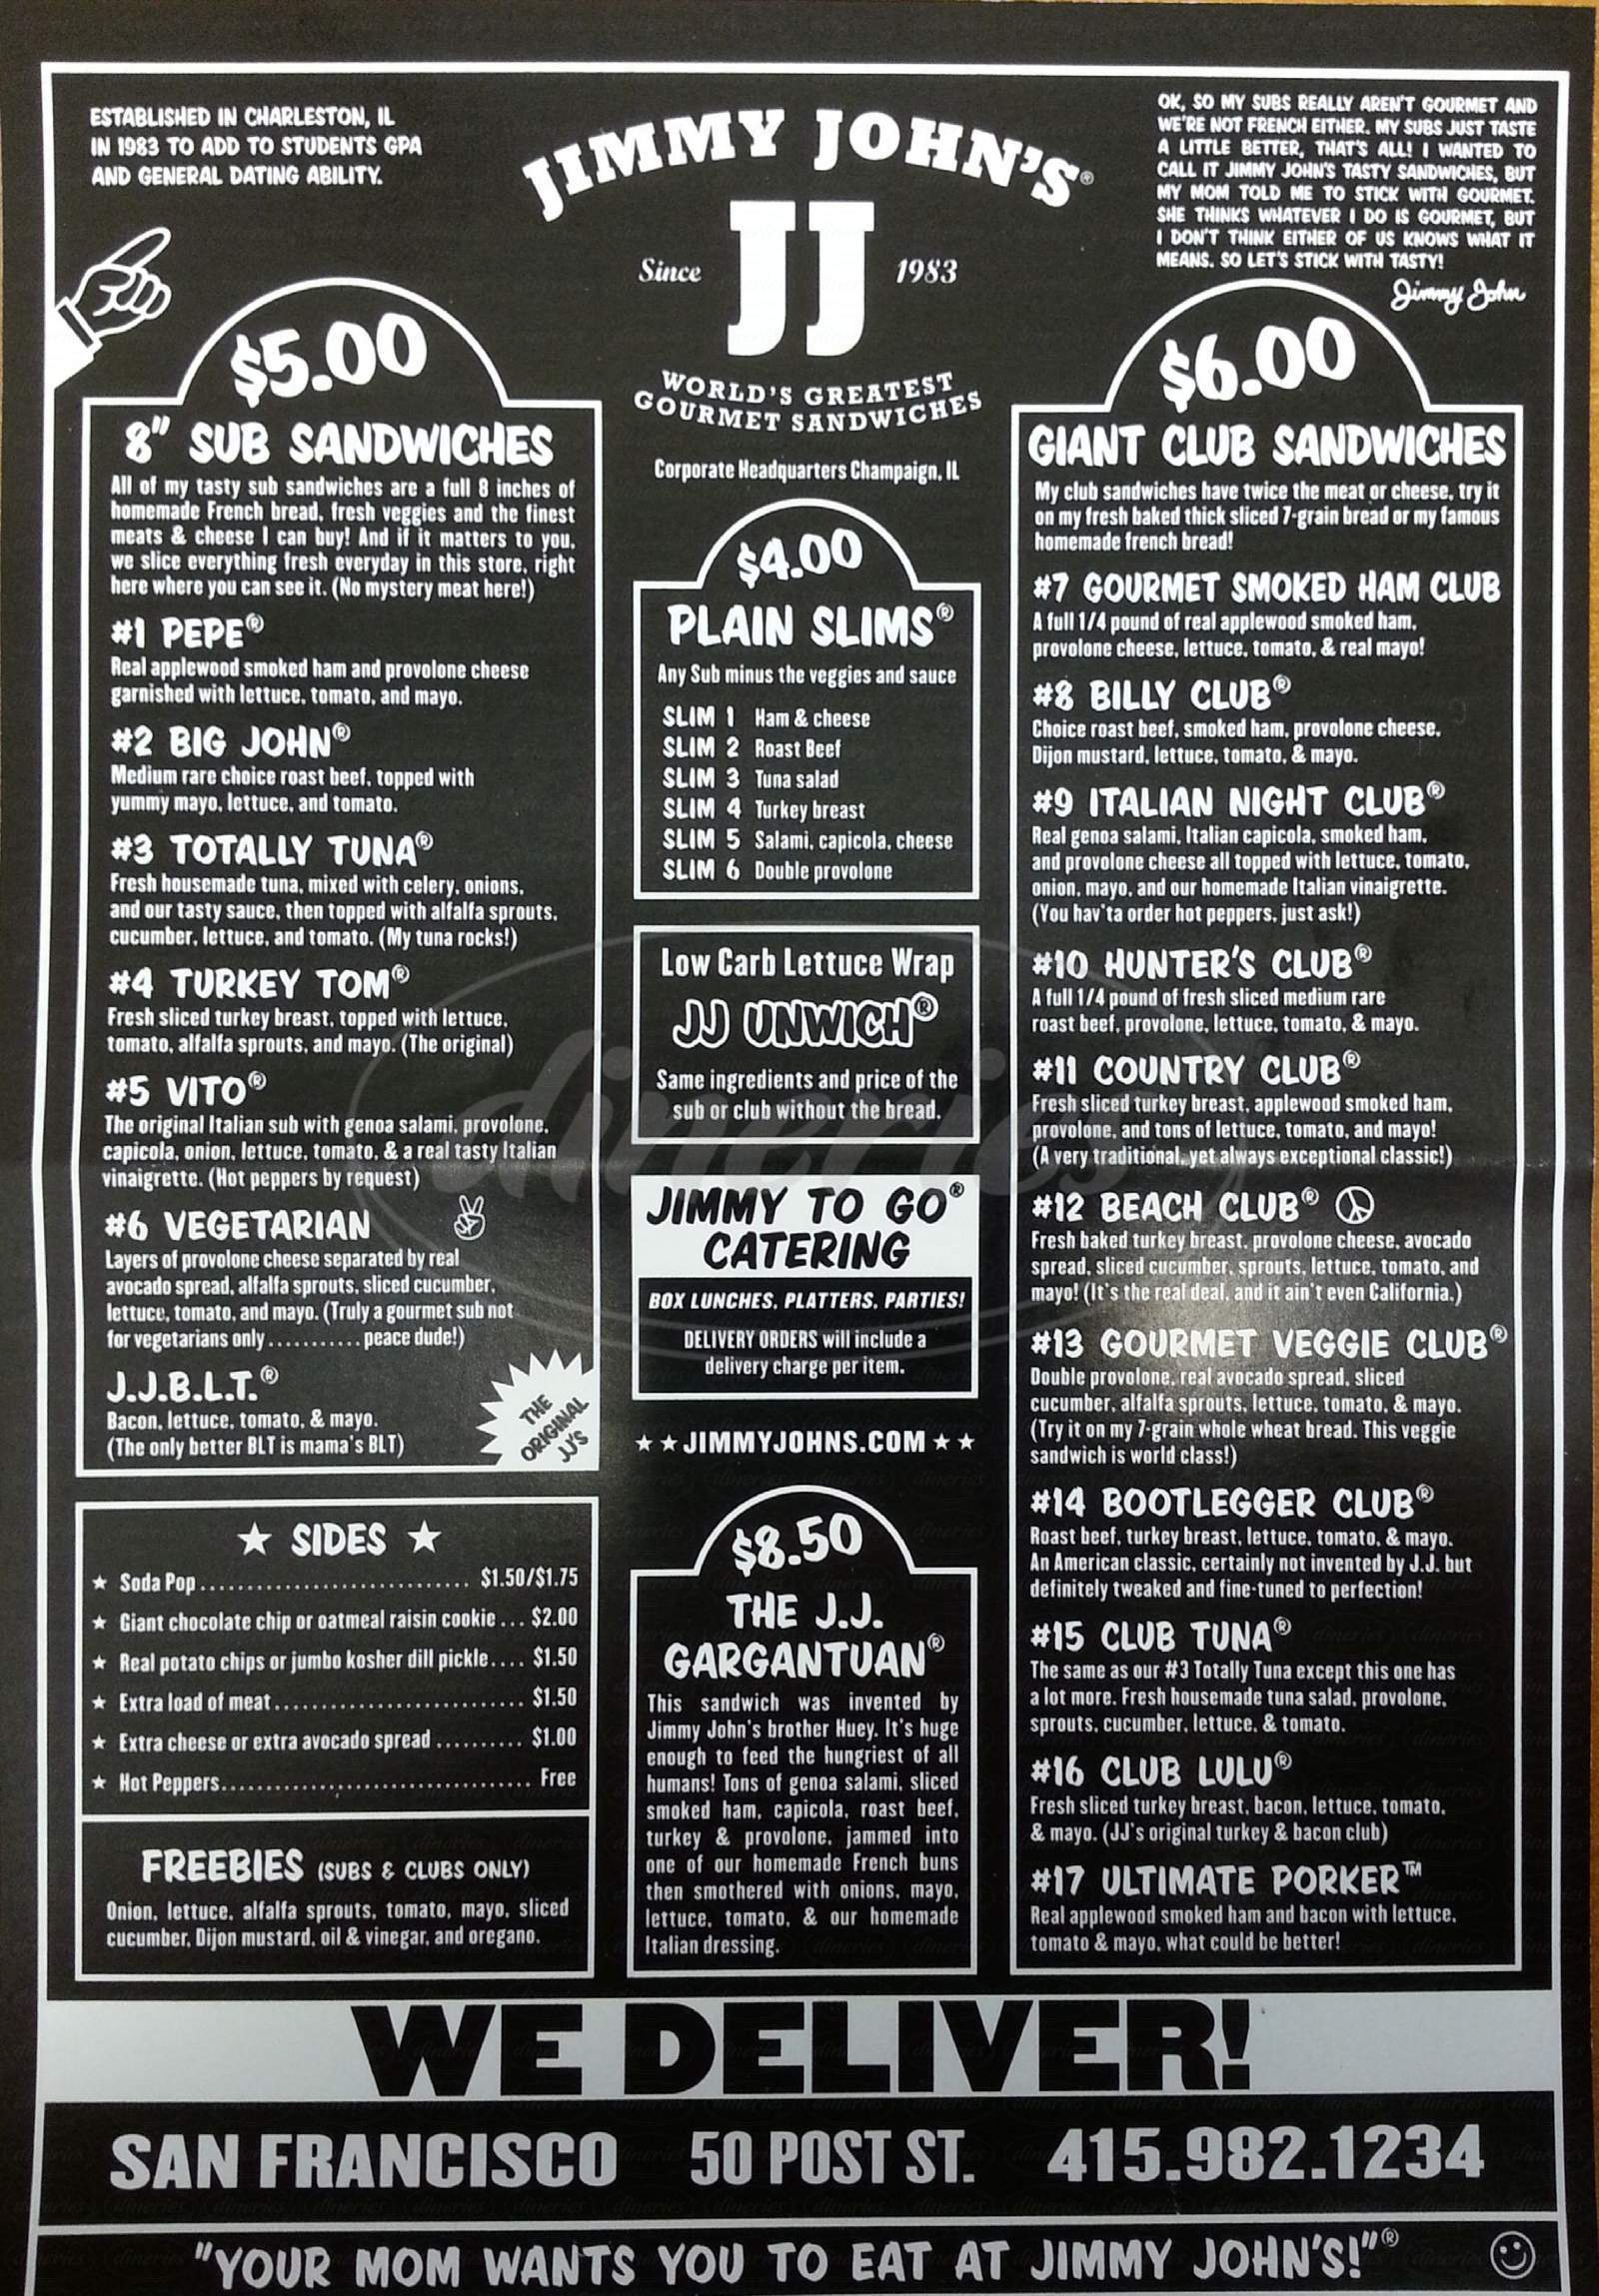 menu for Jimmy John's